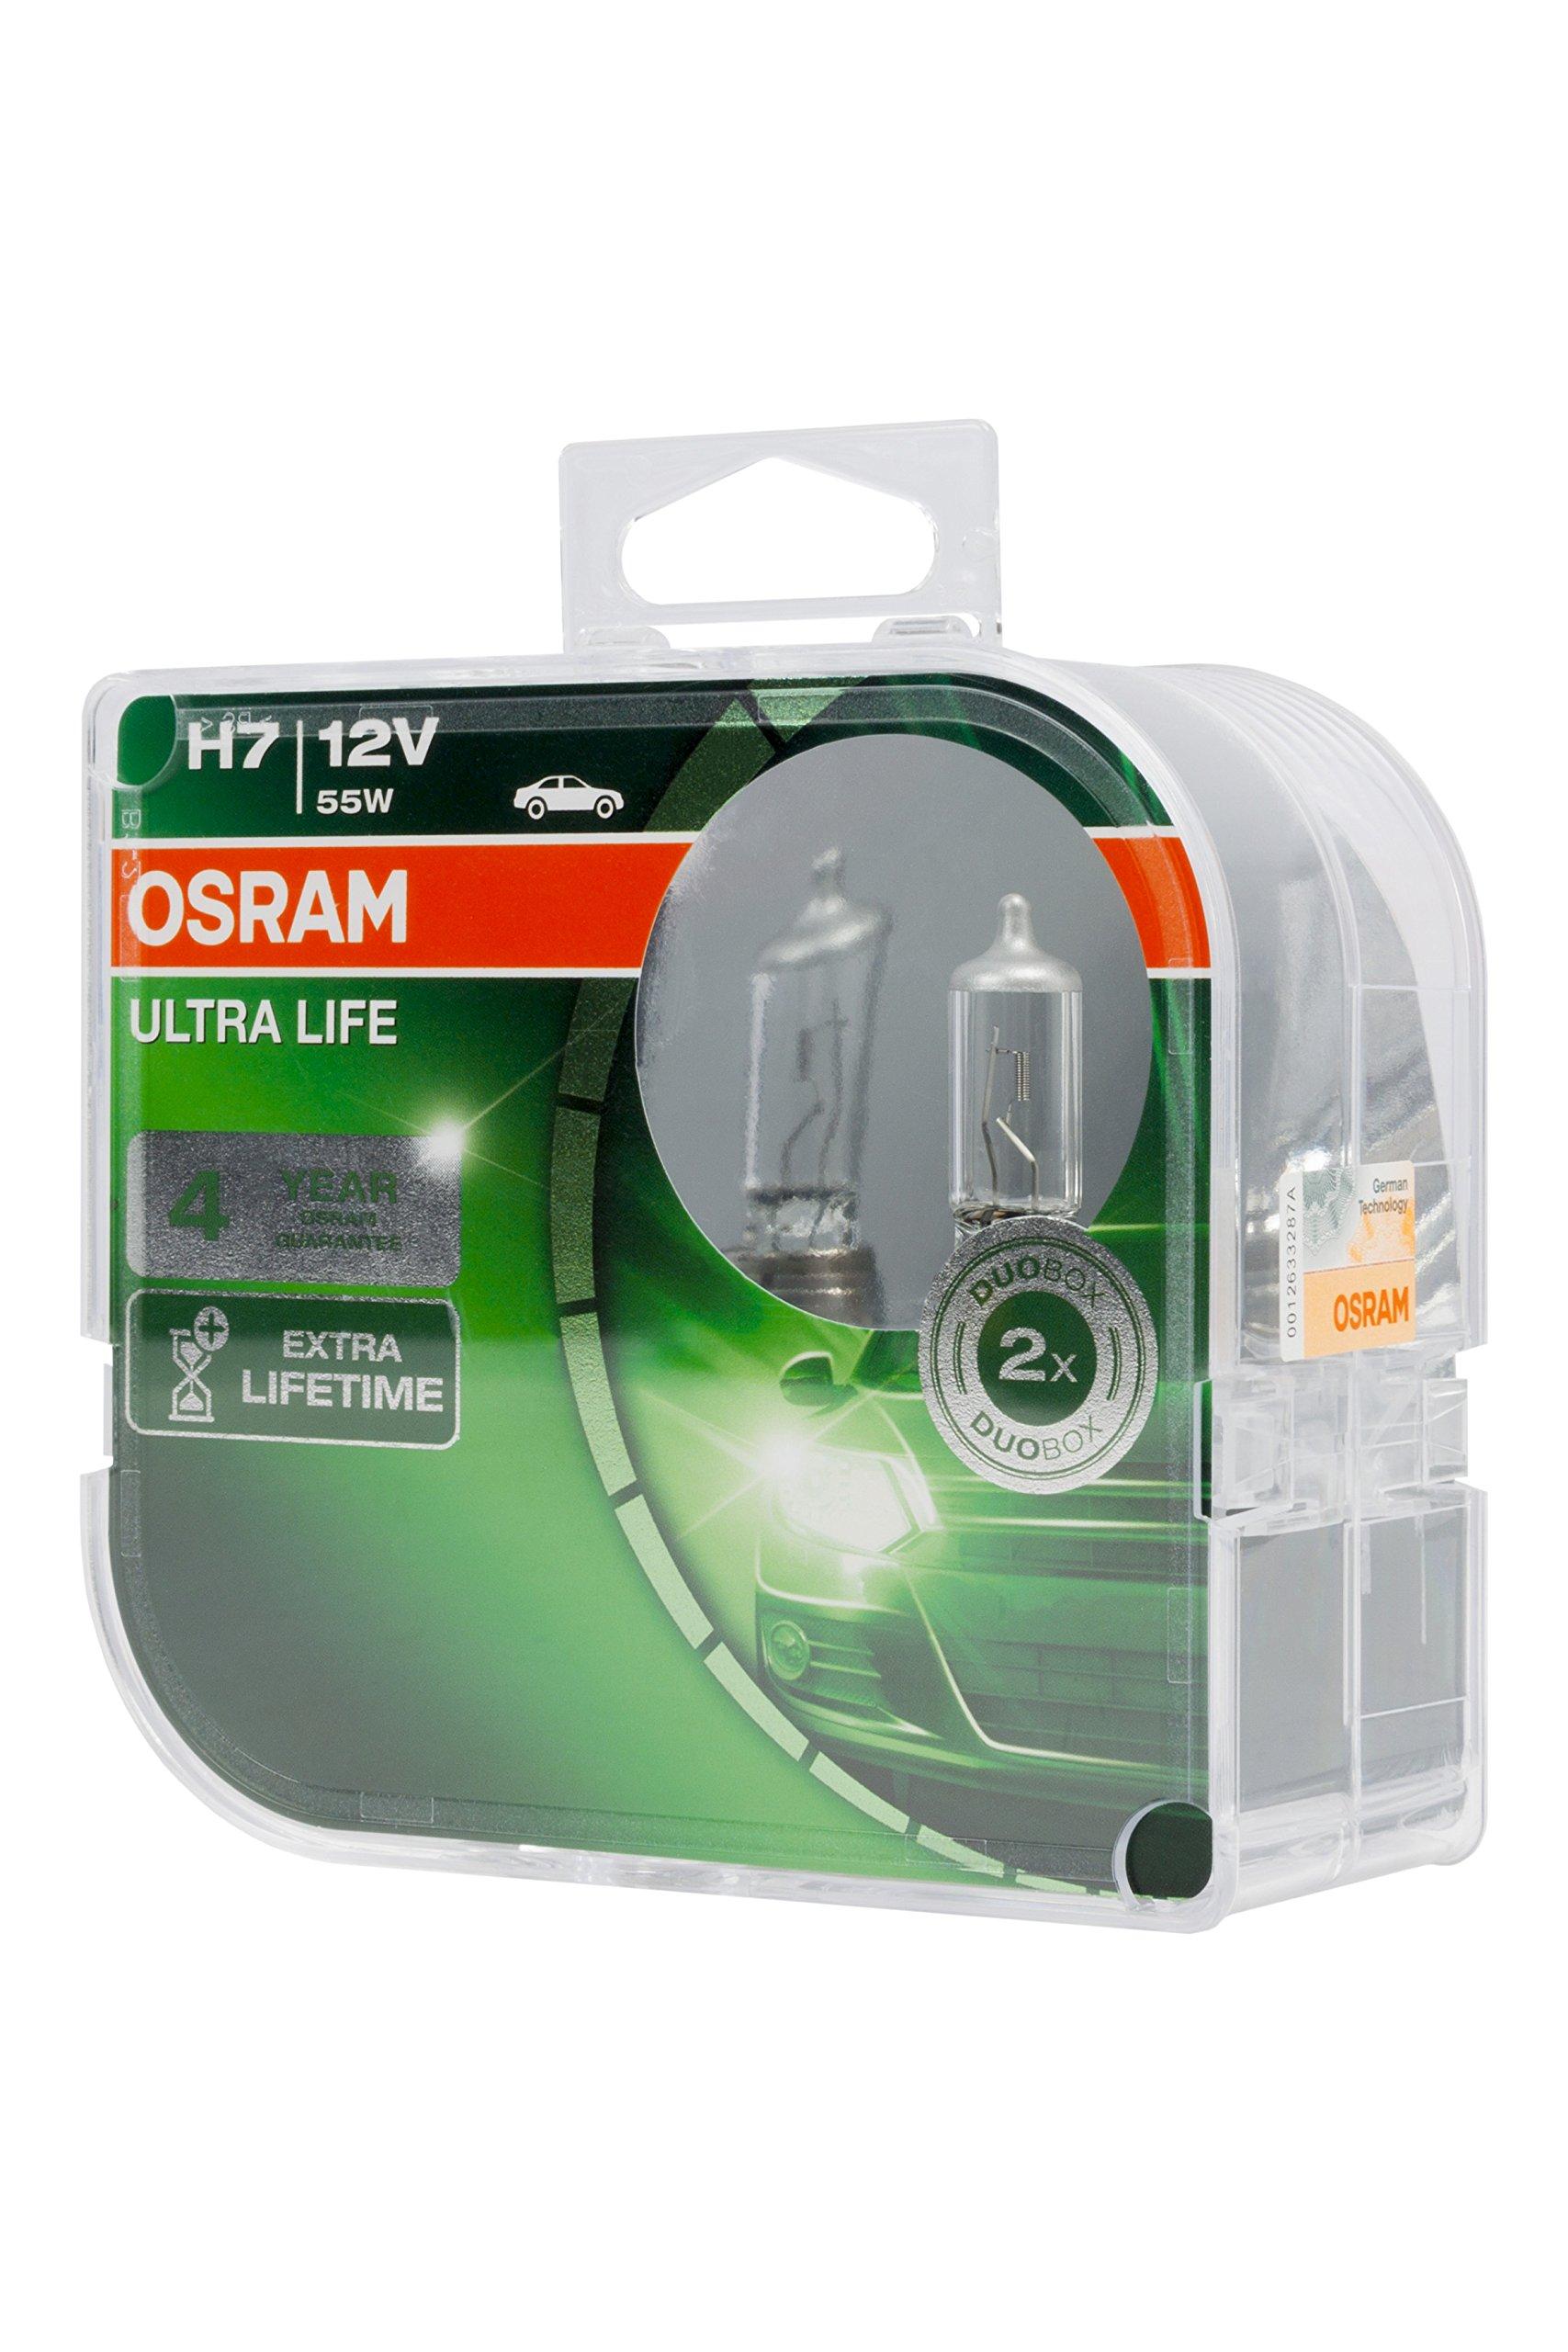 2x Opel Corsa C Genuine Osram Ultra Life High Main Beam Headlight Bulbs Pair